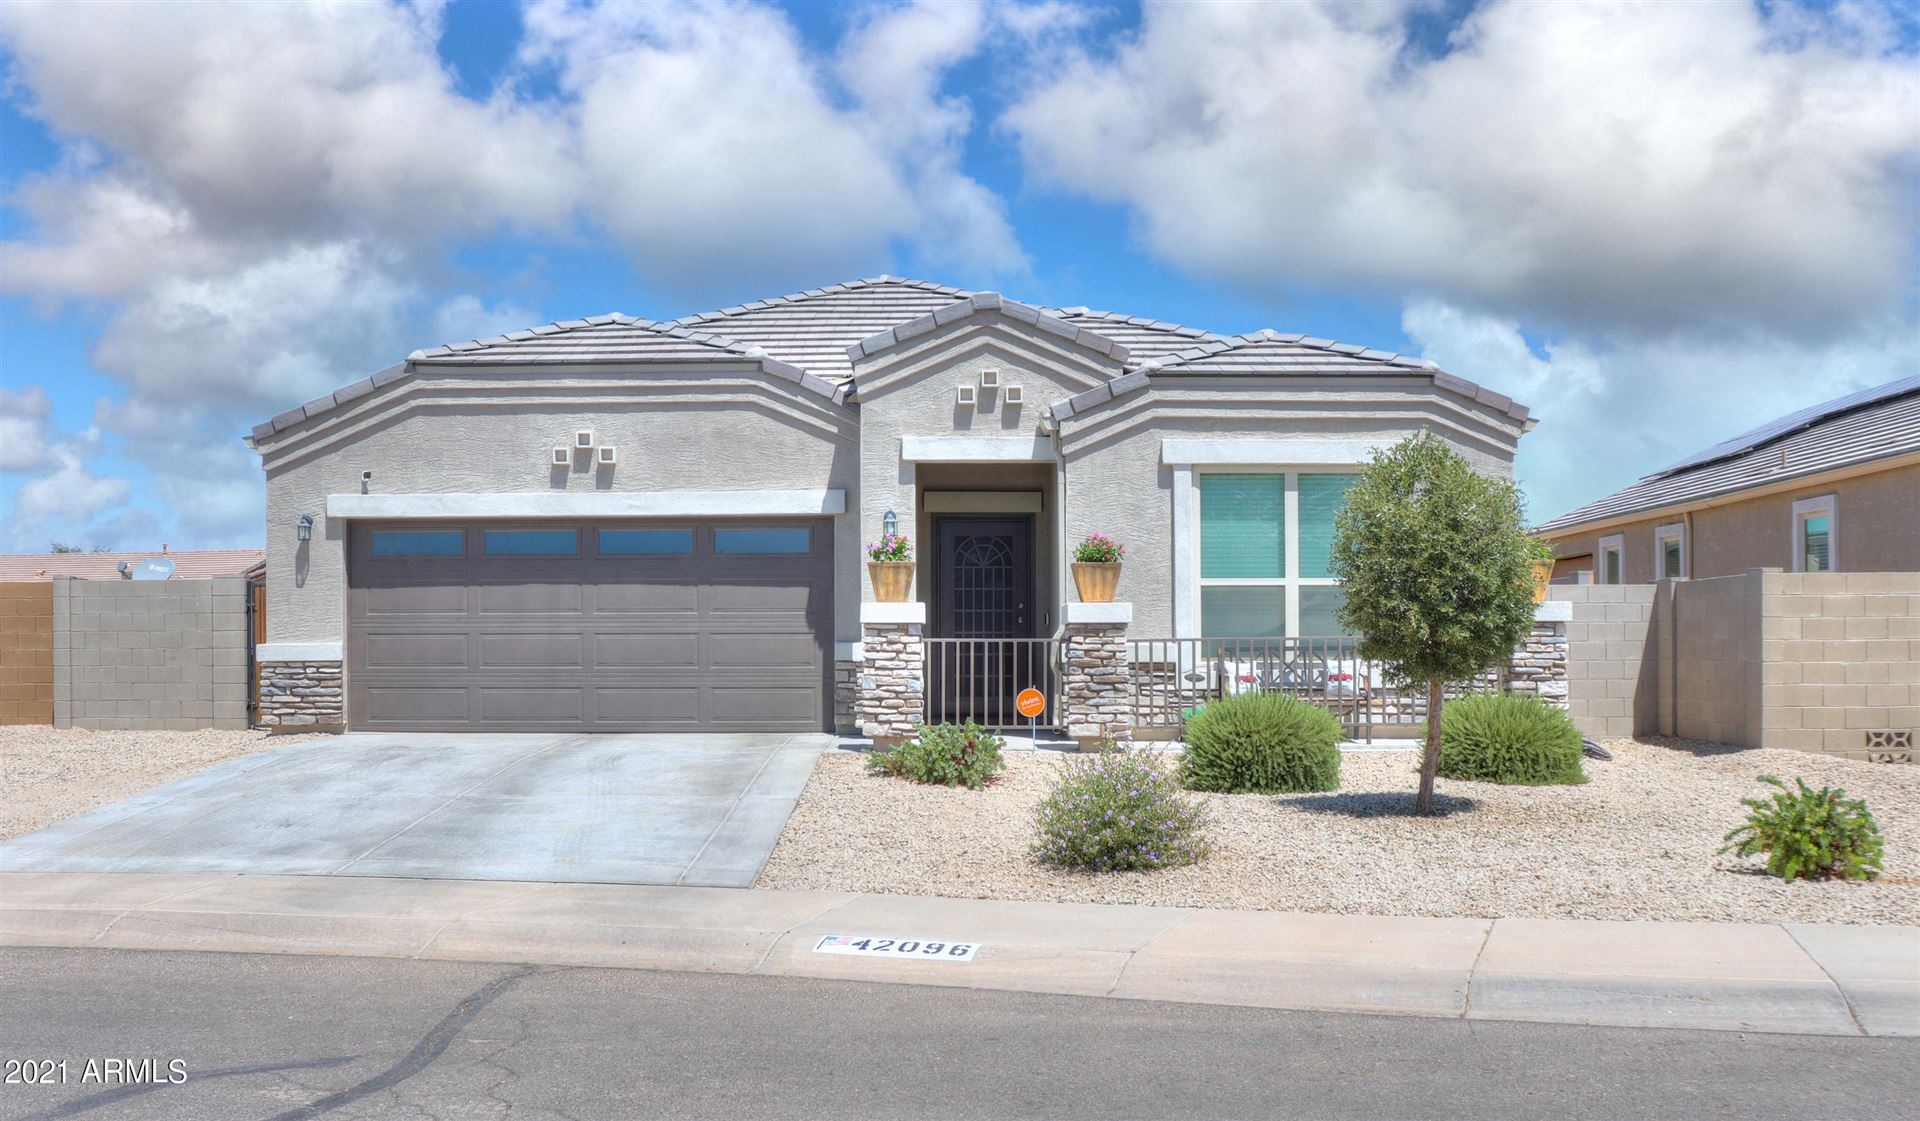 Photo for 42096 W QUINTO Drive, Maricopa, AZ 85138 (MLS # 6262494)